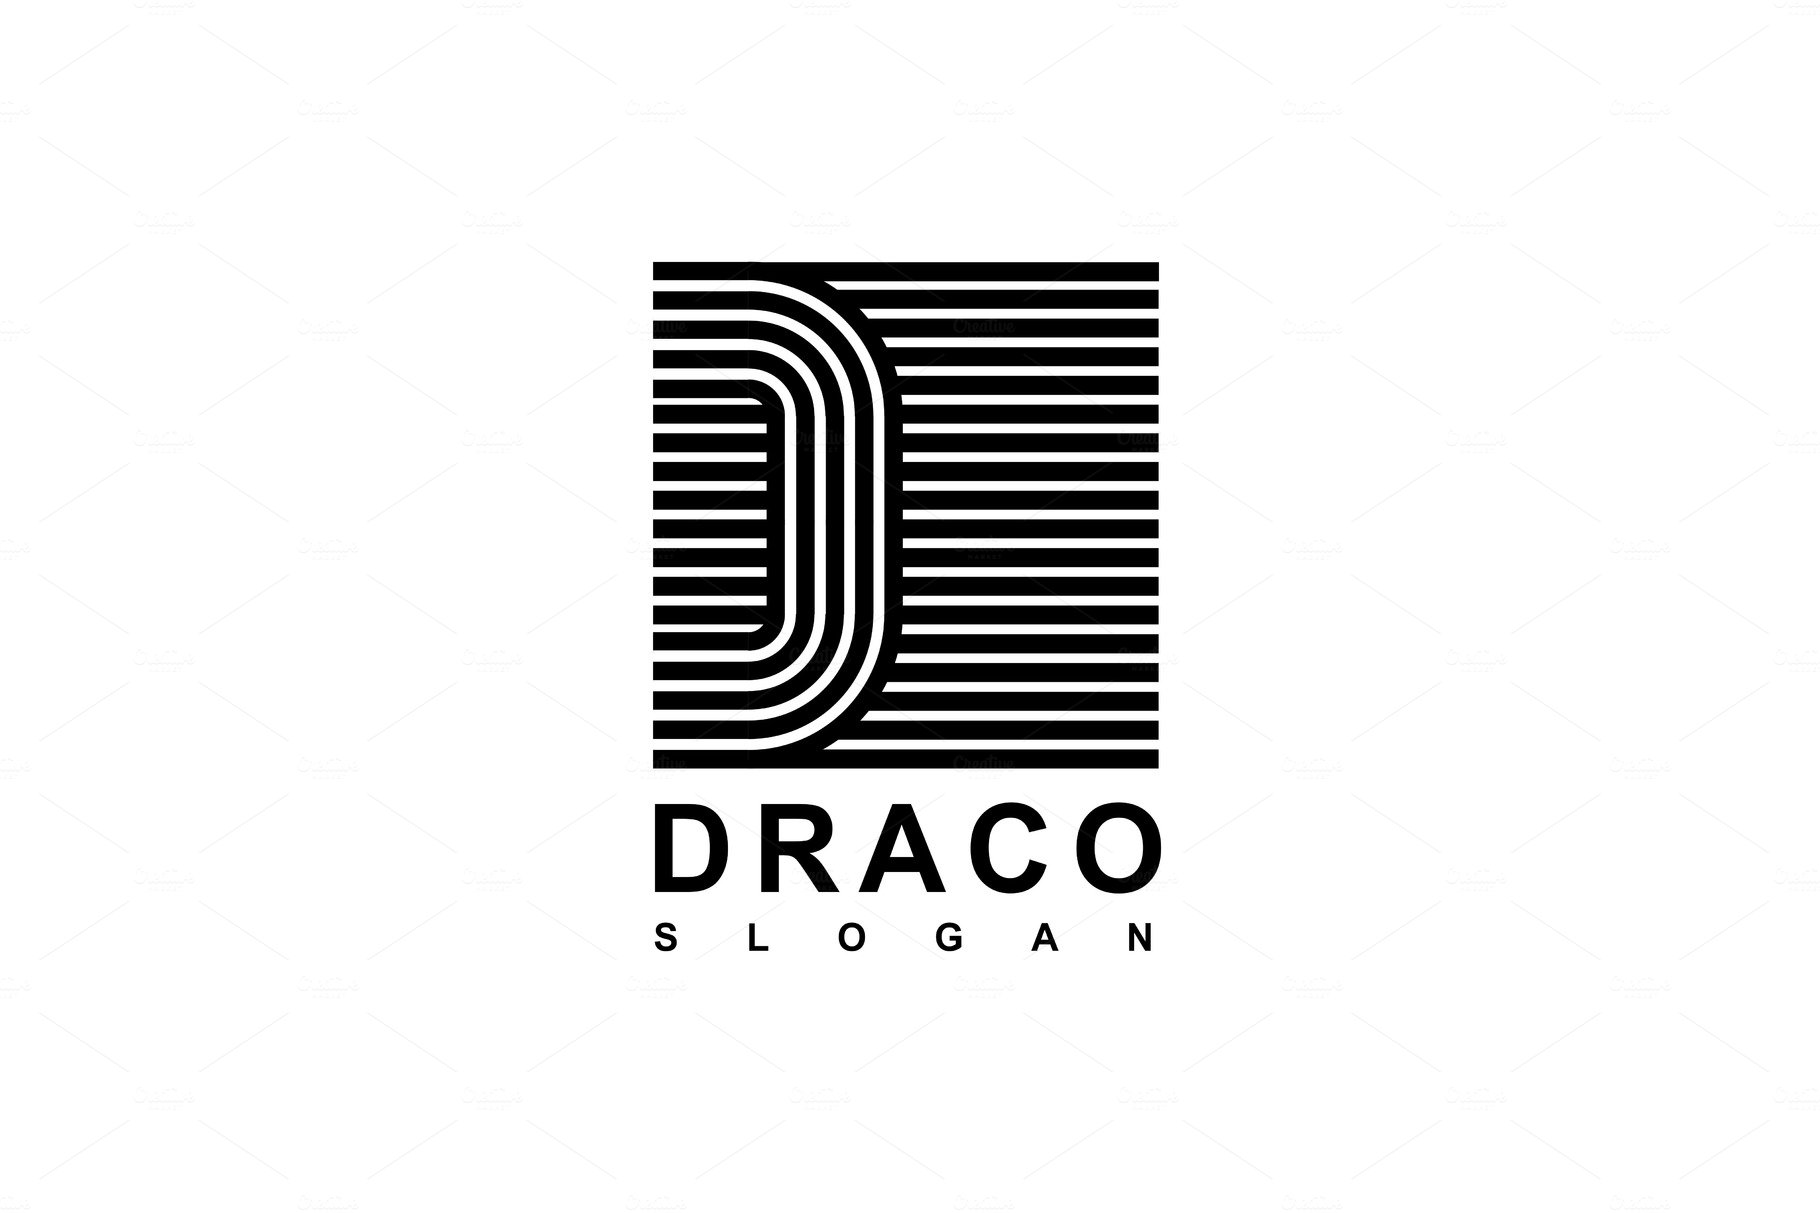 Logo Capital Letter D Illustrations Creative Market